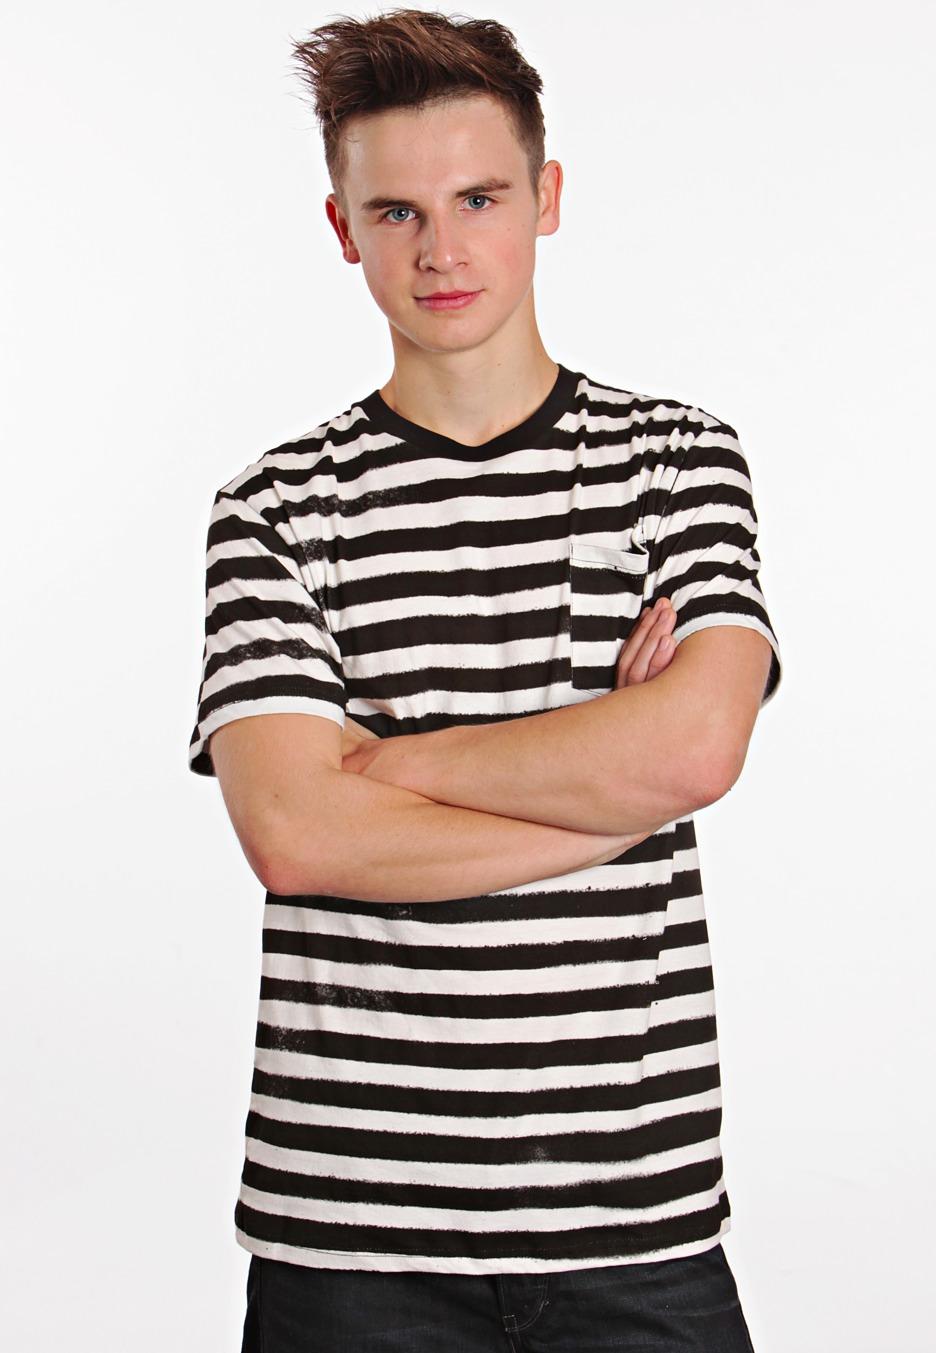 Black t shirt with white stripes - Iron Fist Pugsly Black Stripes White T Shirt Impericon Com Worldwide